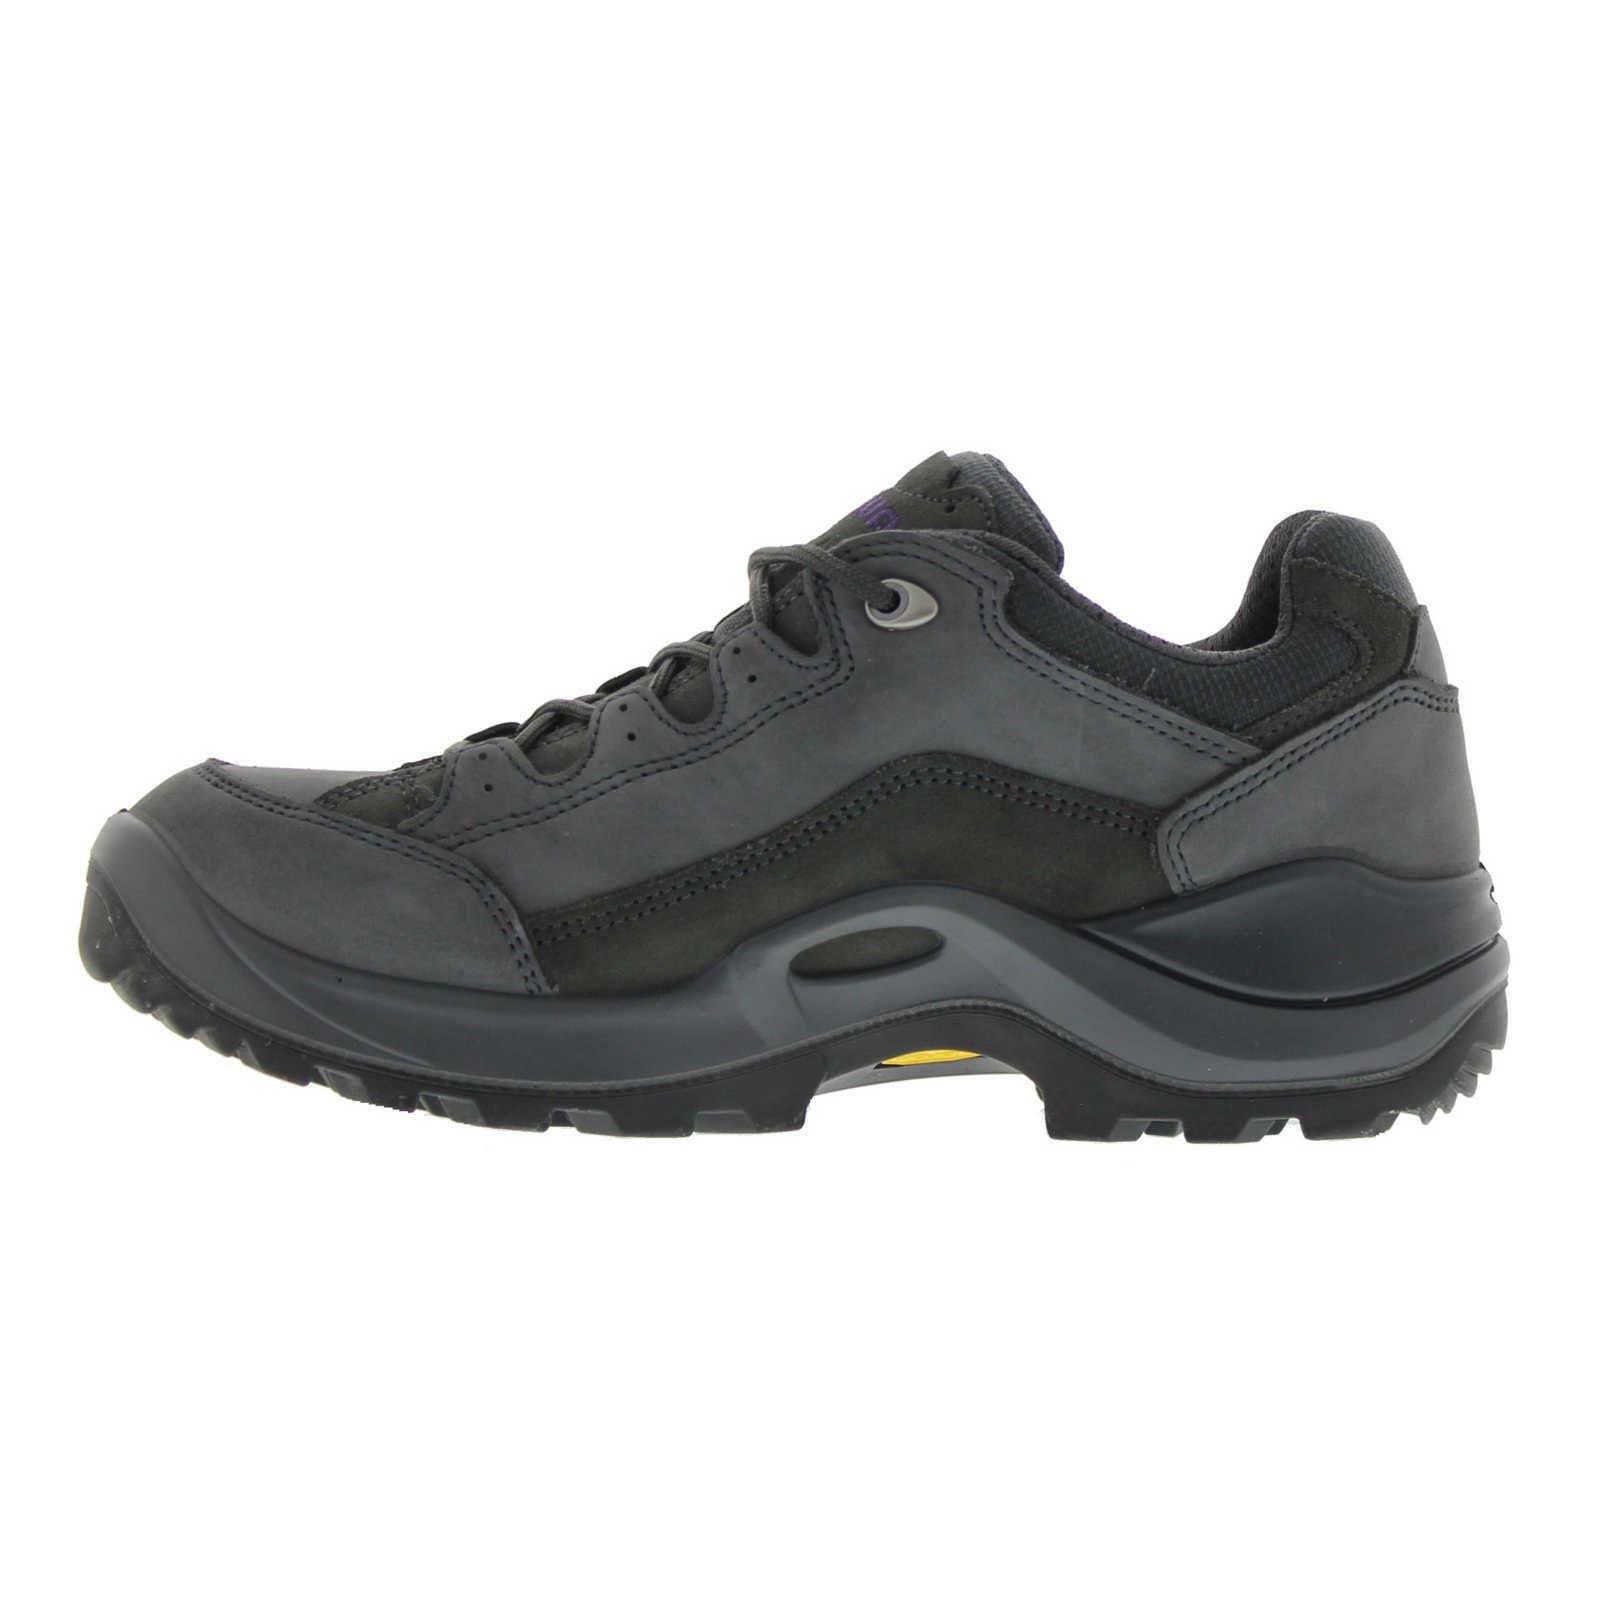 Lowa Womens Renegade II Gore-Tex Lo Prune Nubuck Shoes